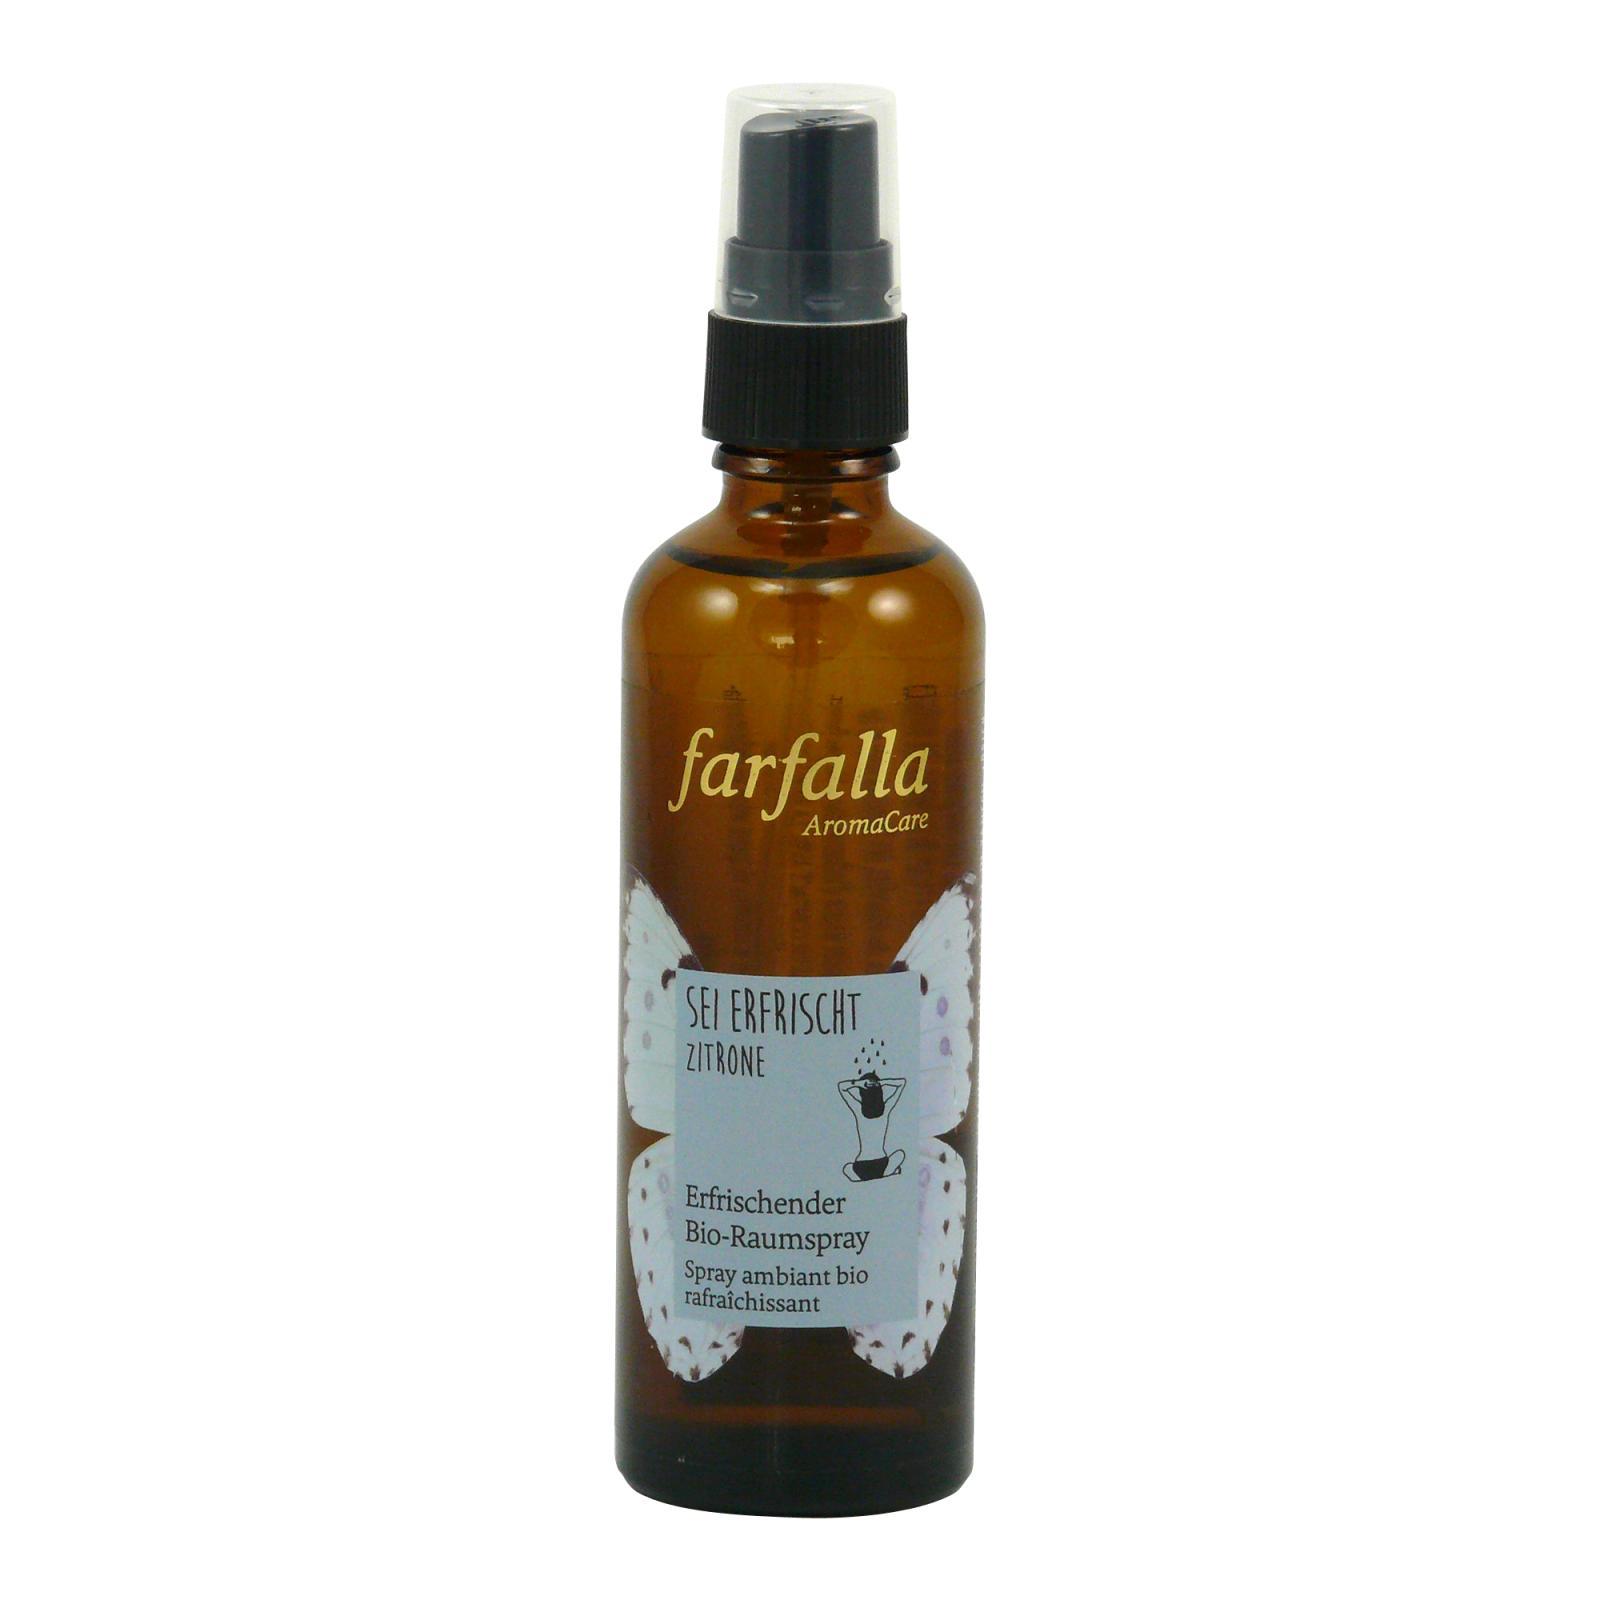 Farfalla Osvěžovač vzduchu Osvěžující citrón 75 ml